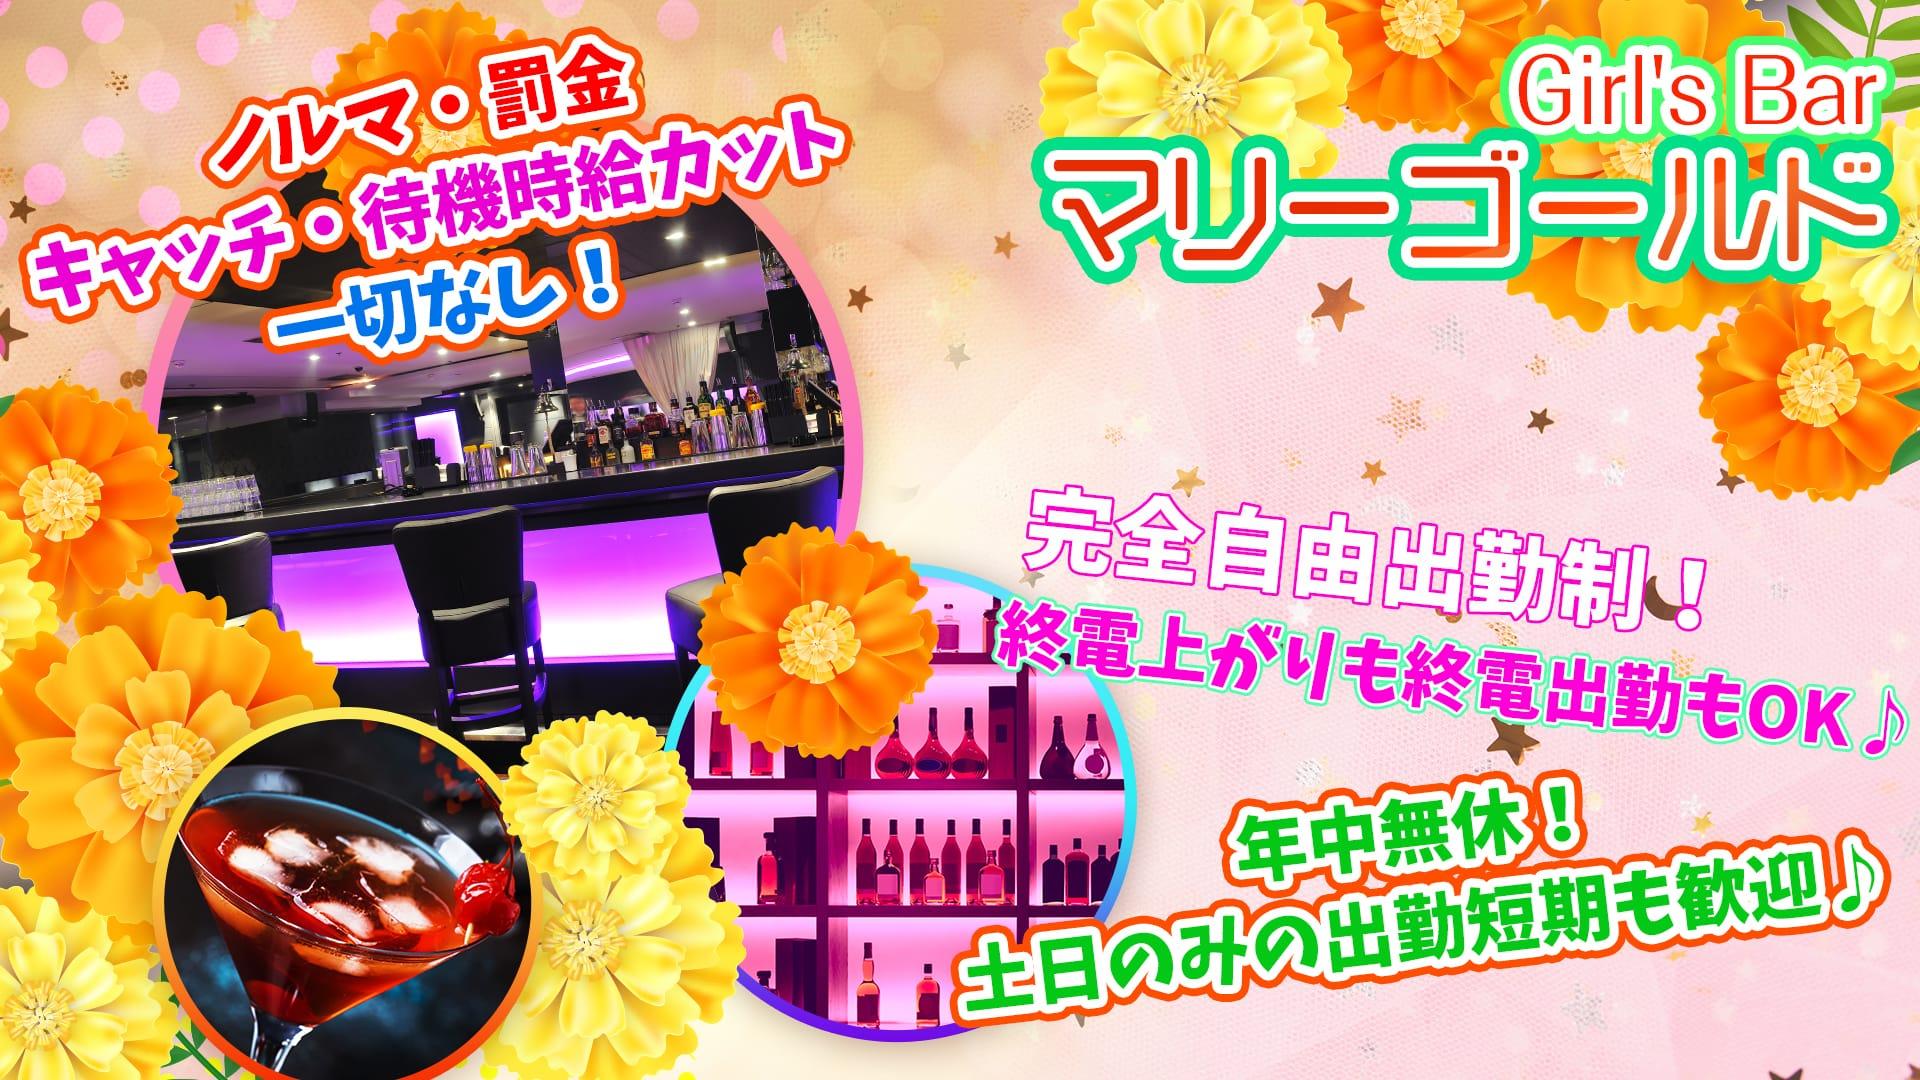 Girl's Bar マリーゴールド【公式求人・体入情報】 錦糸町ガールズバー TOP画像